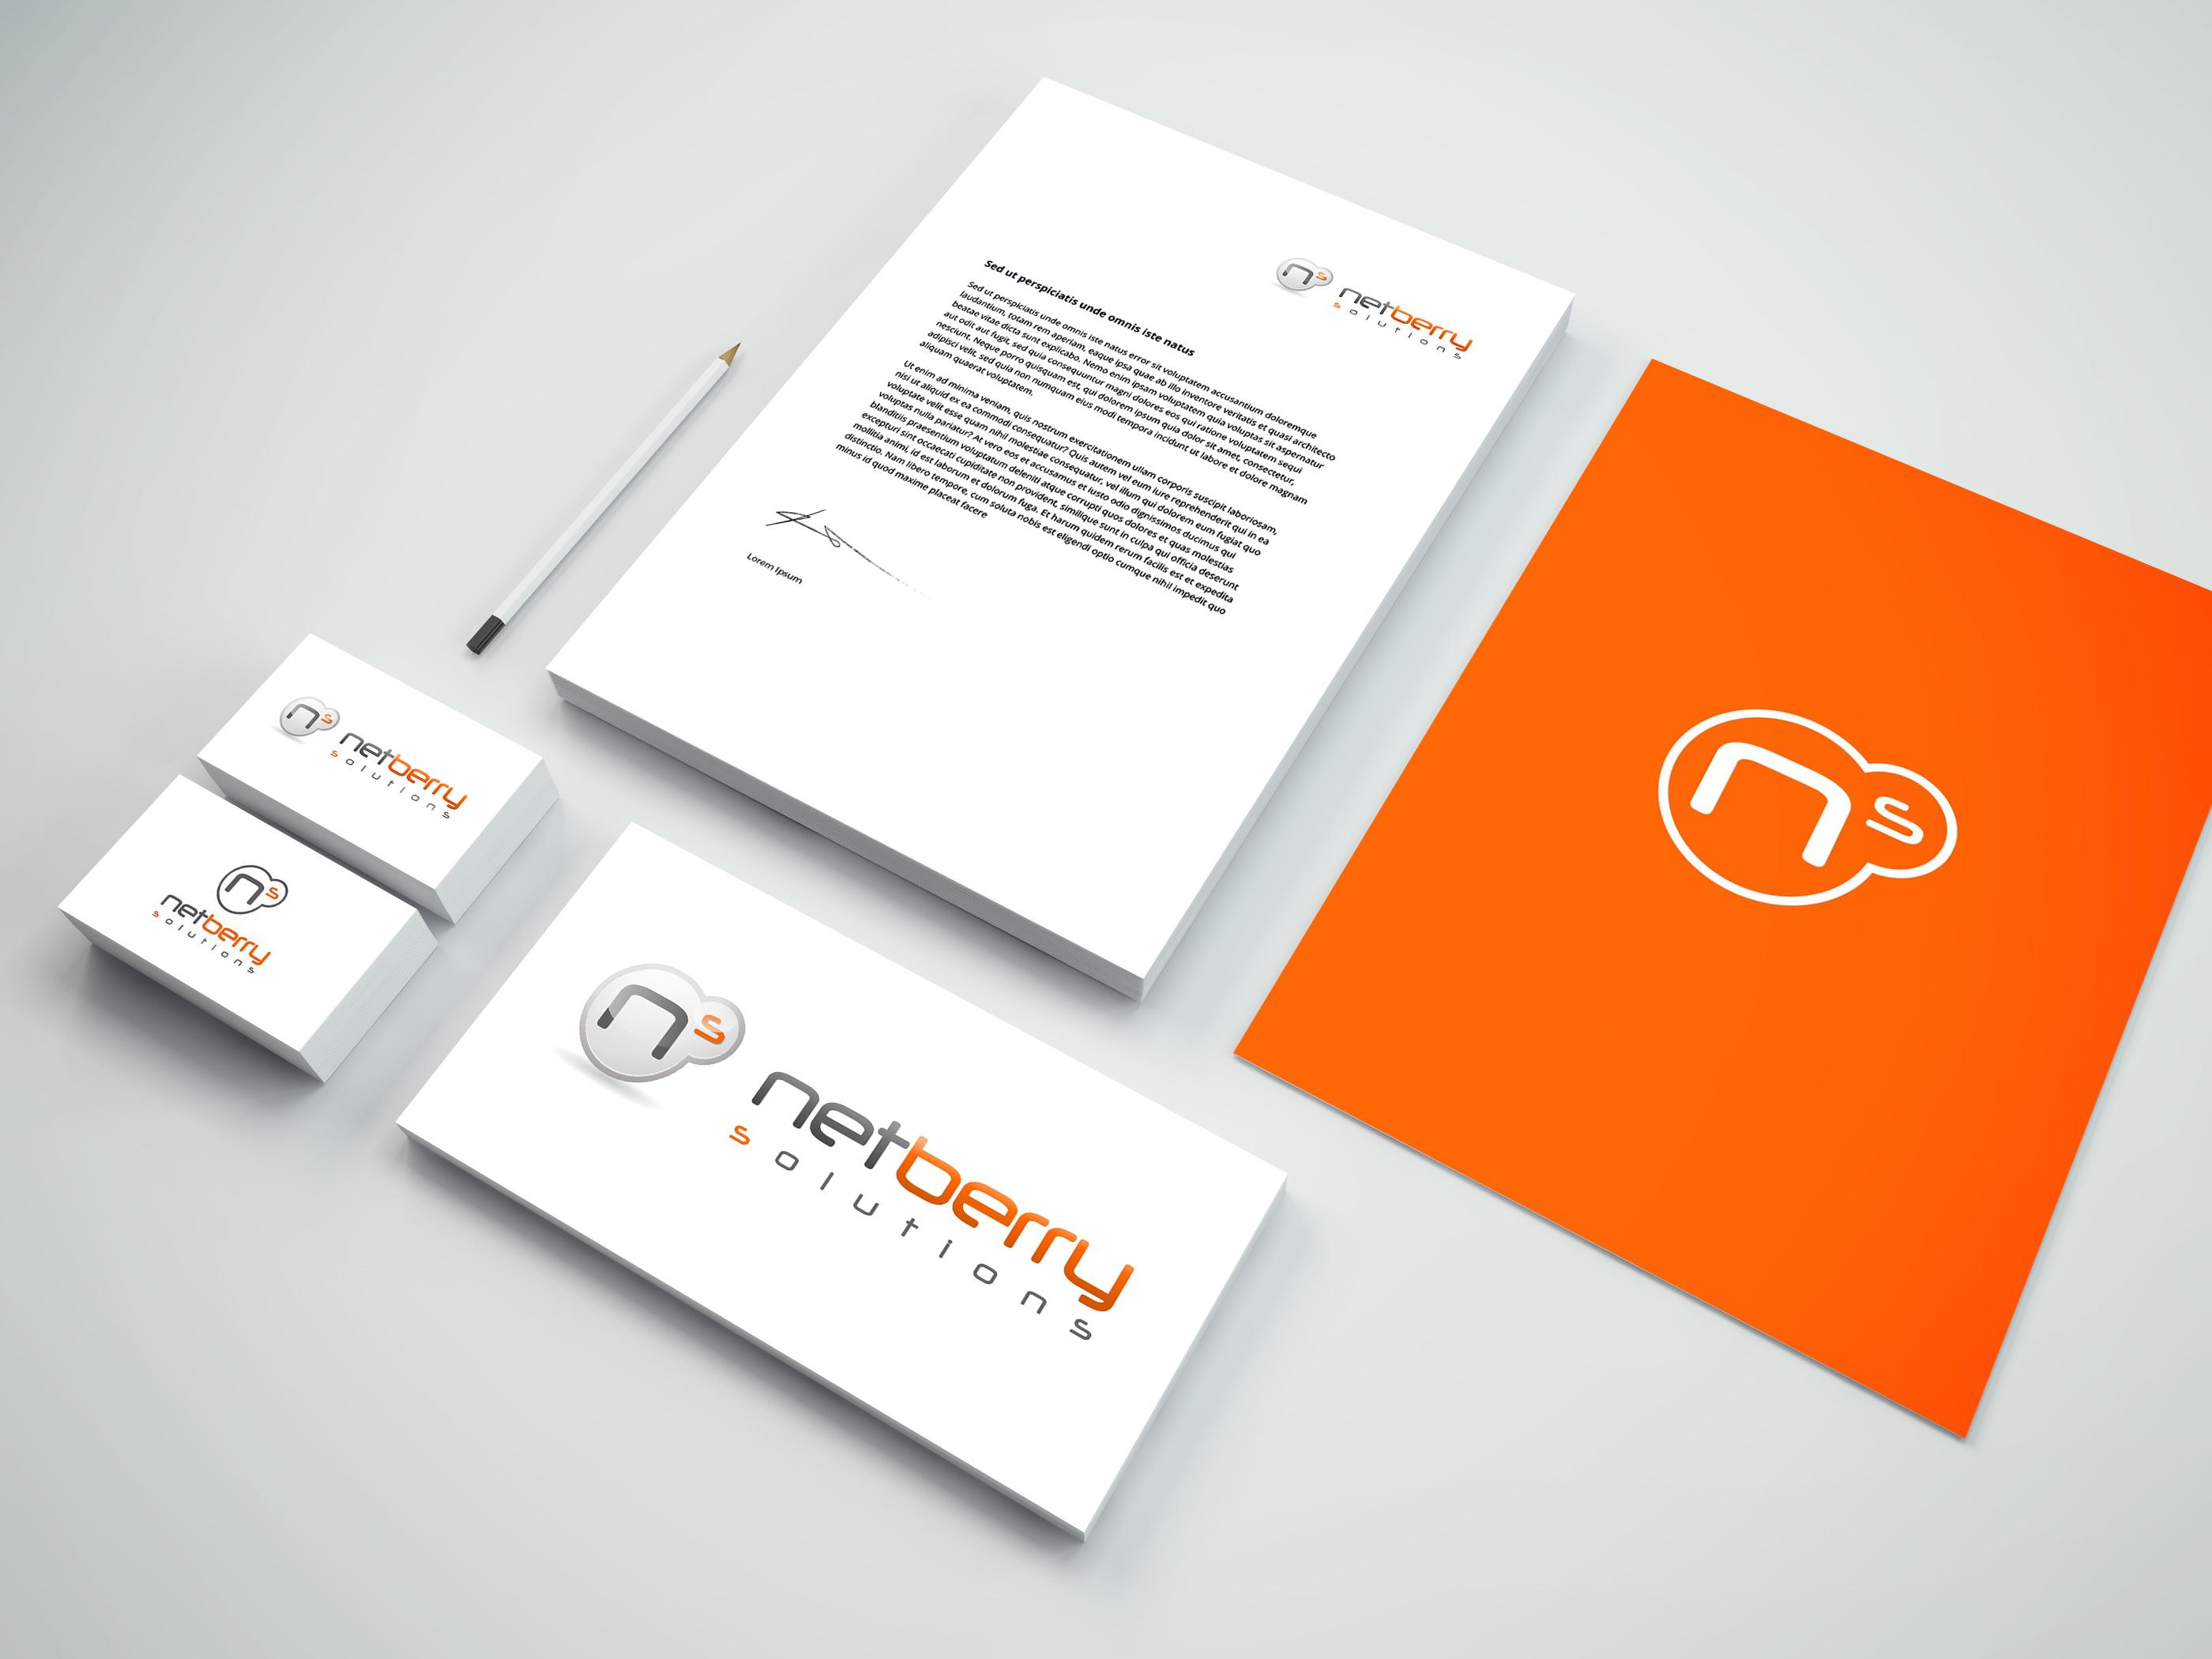 Netberry-Branding-1310x880-01